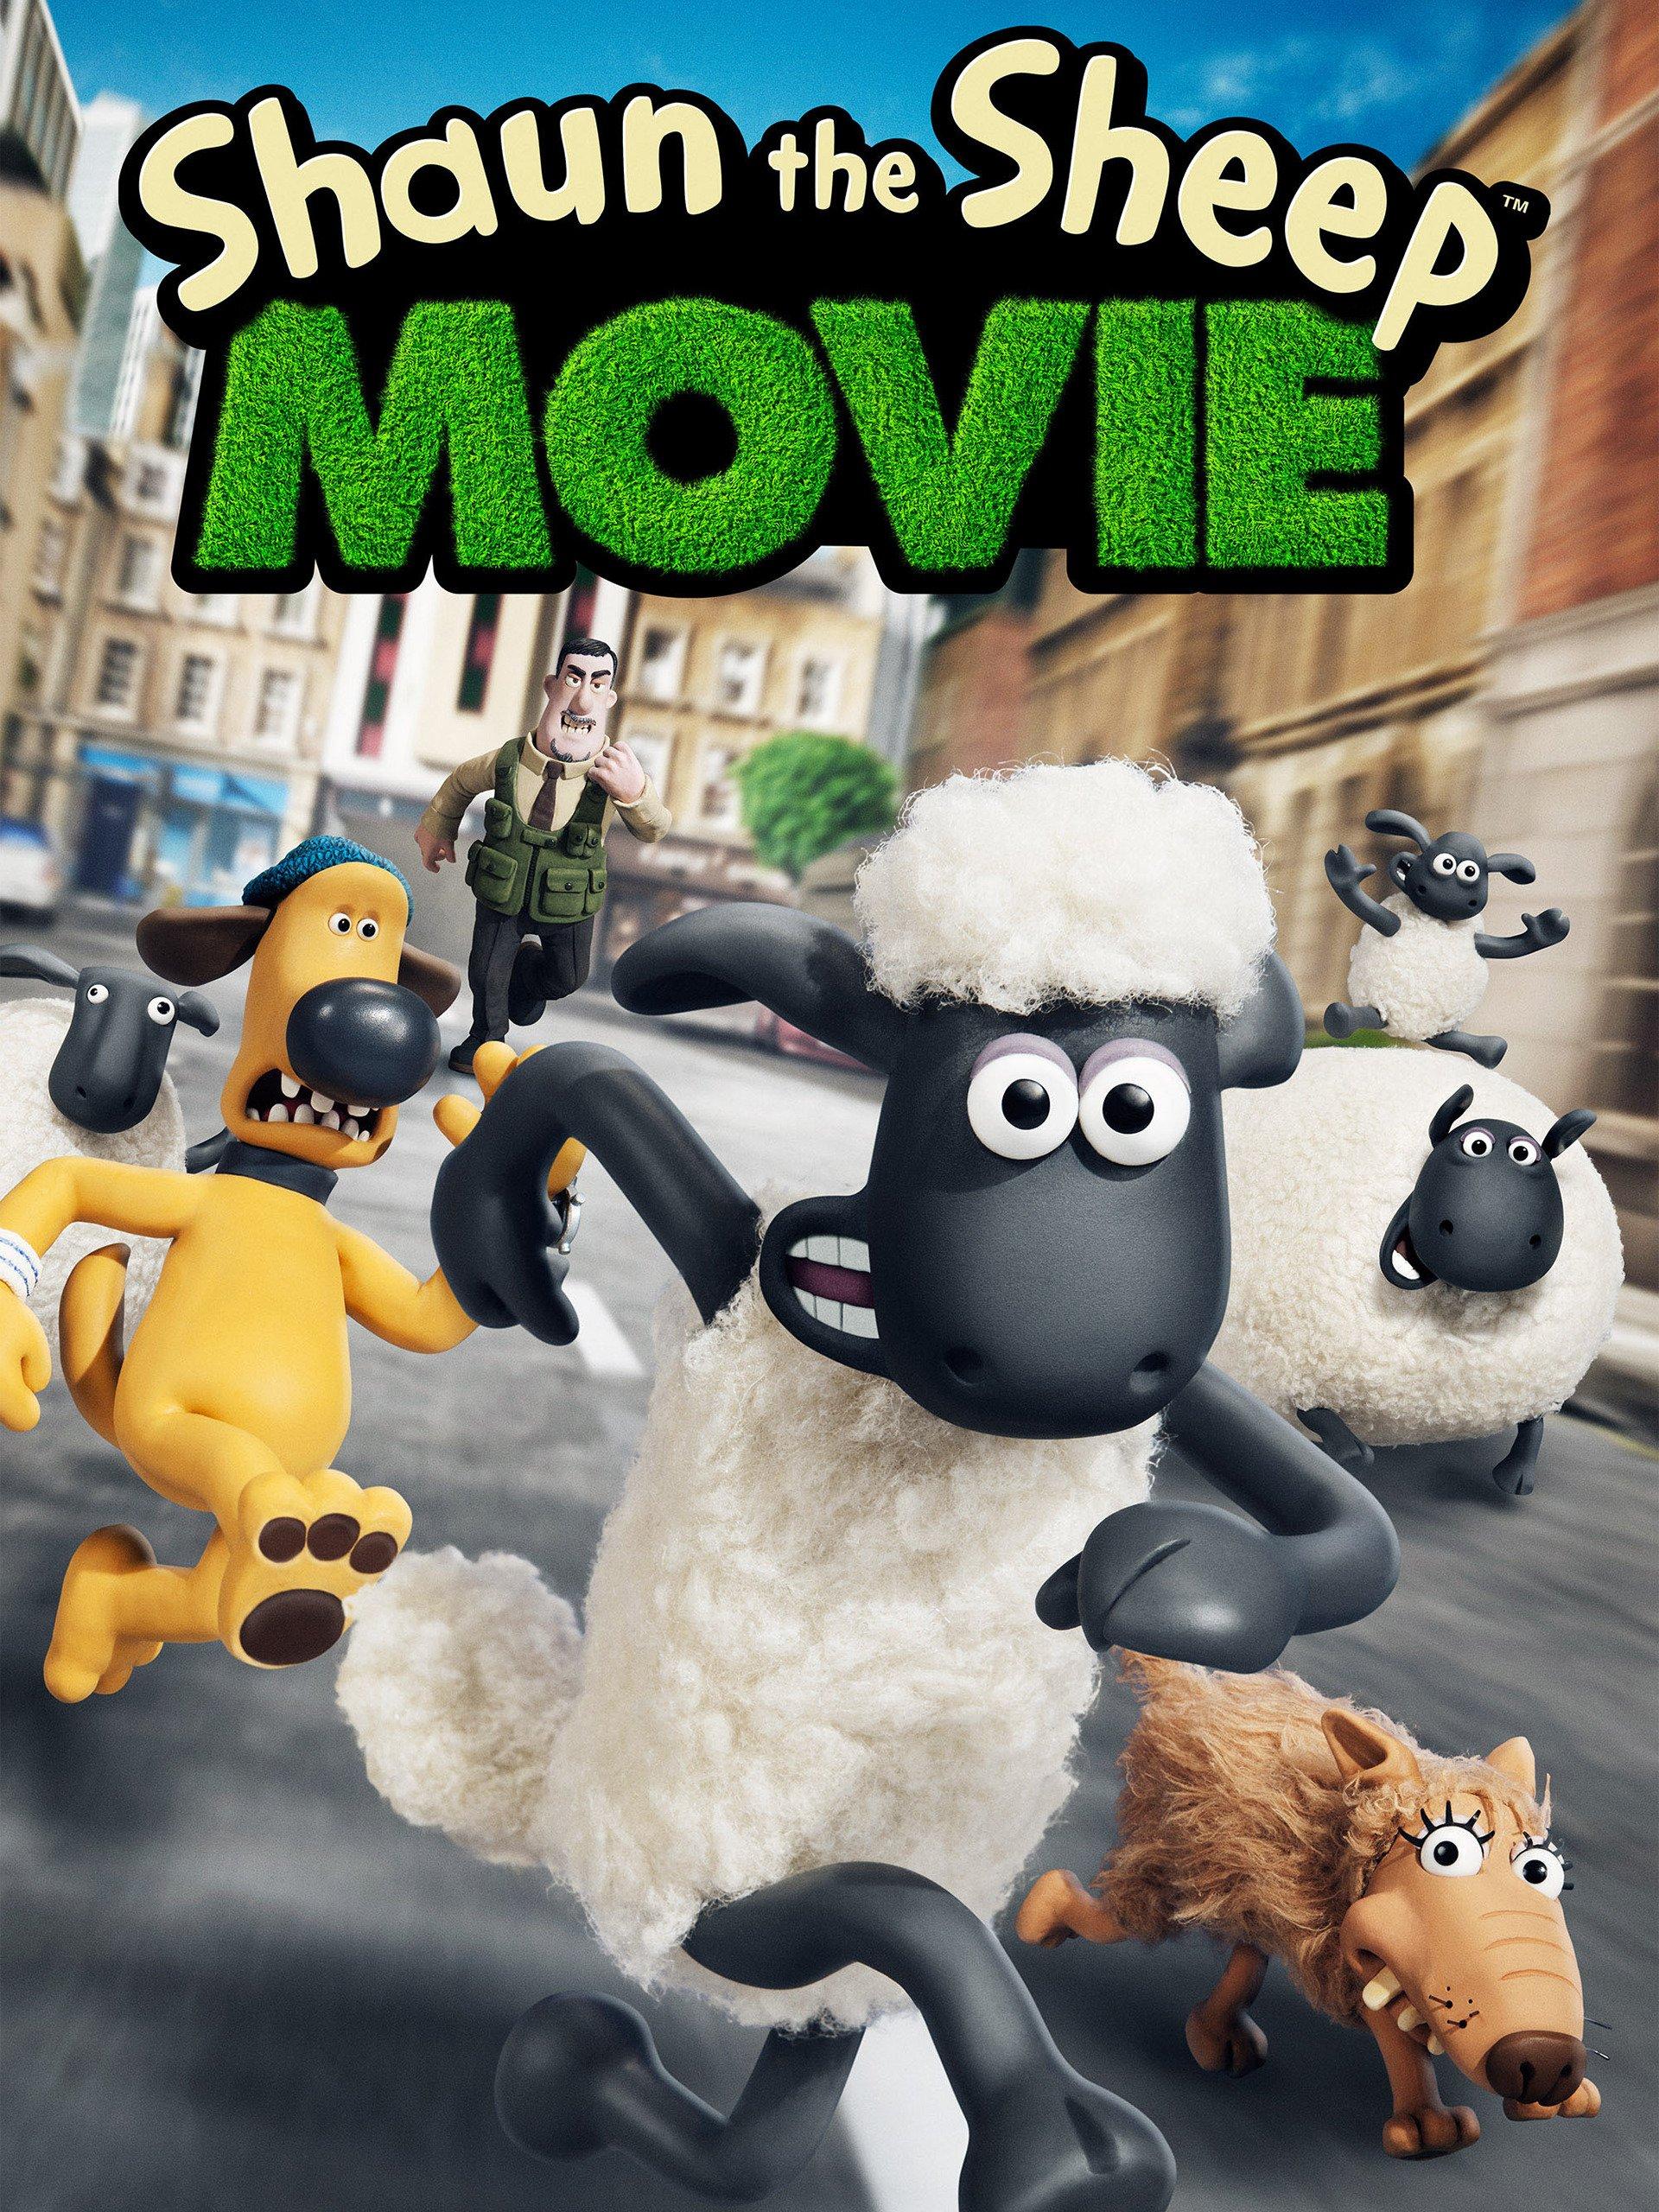 shaun the sheep movies free download